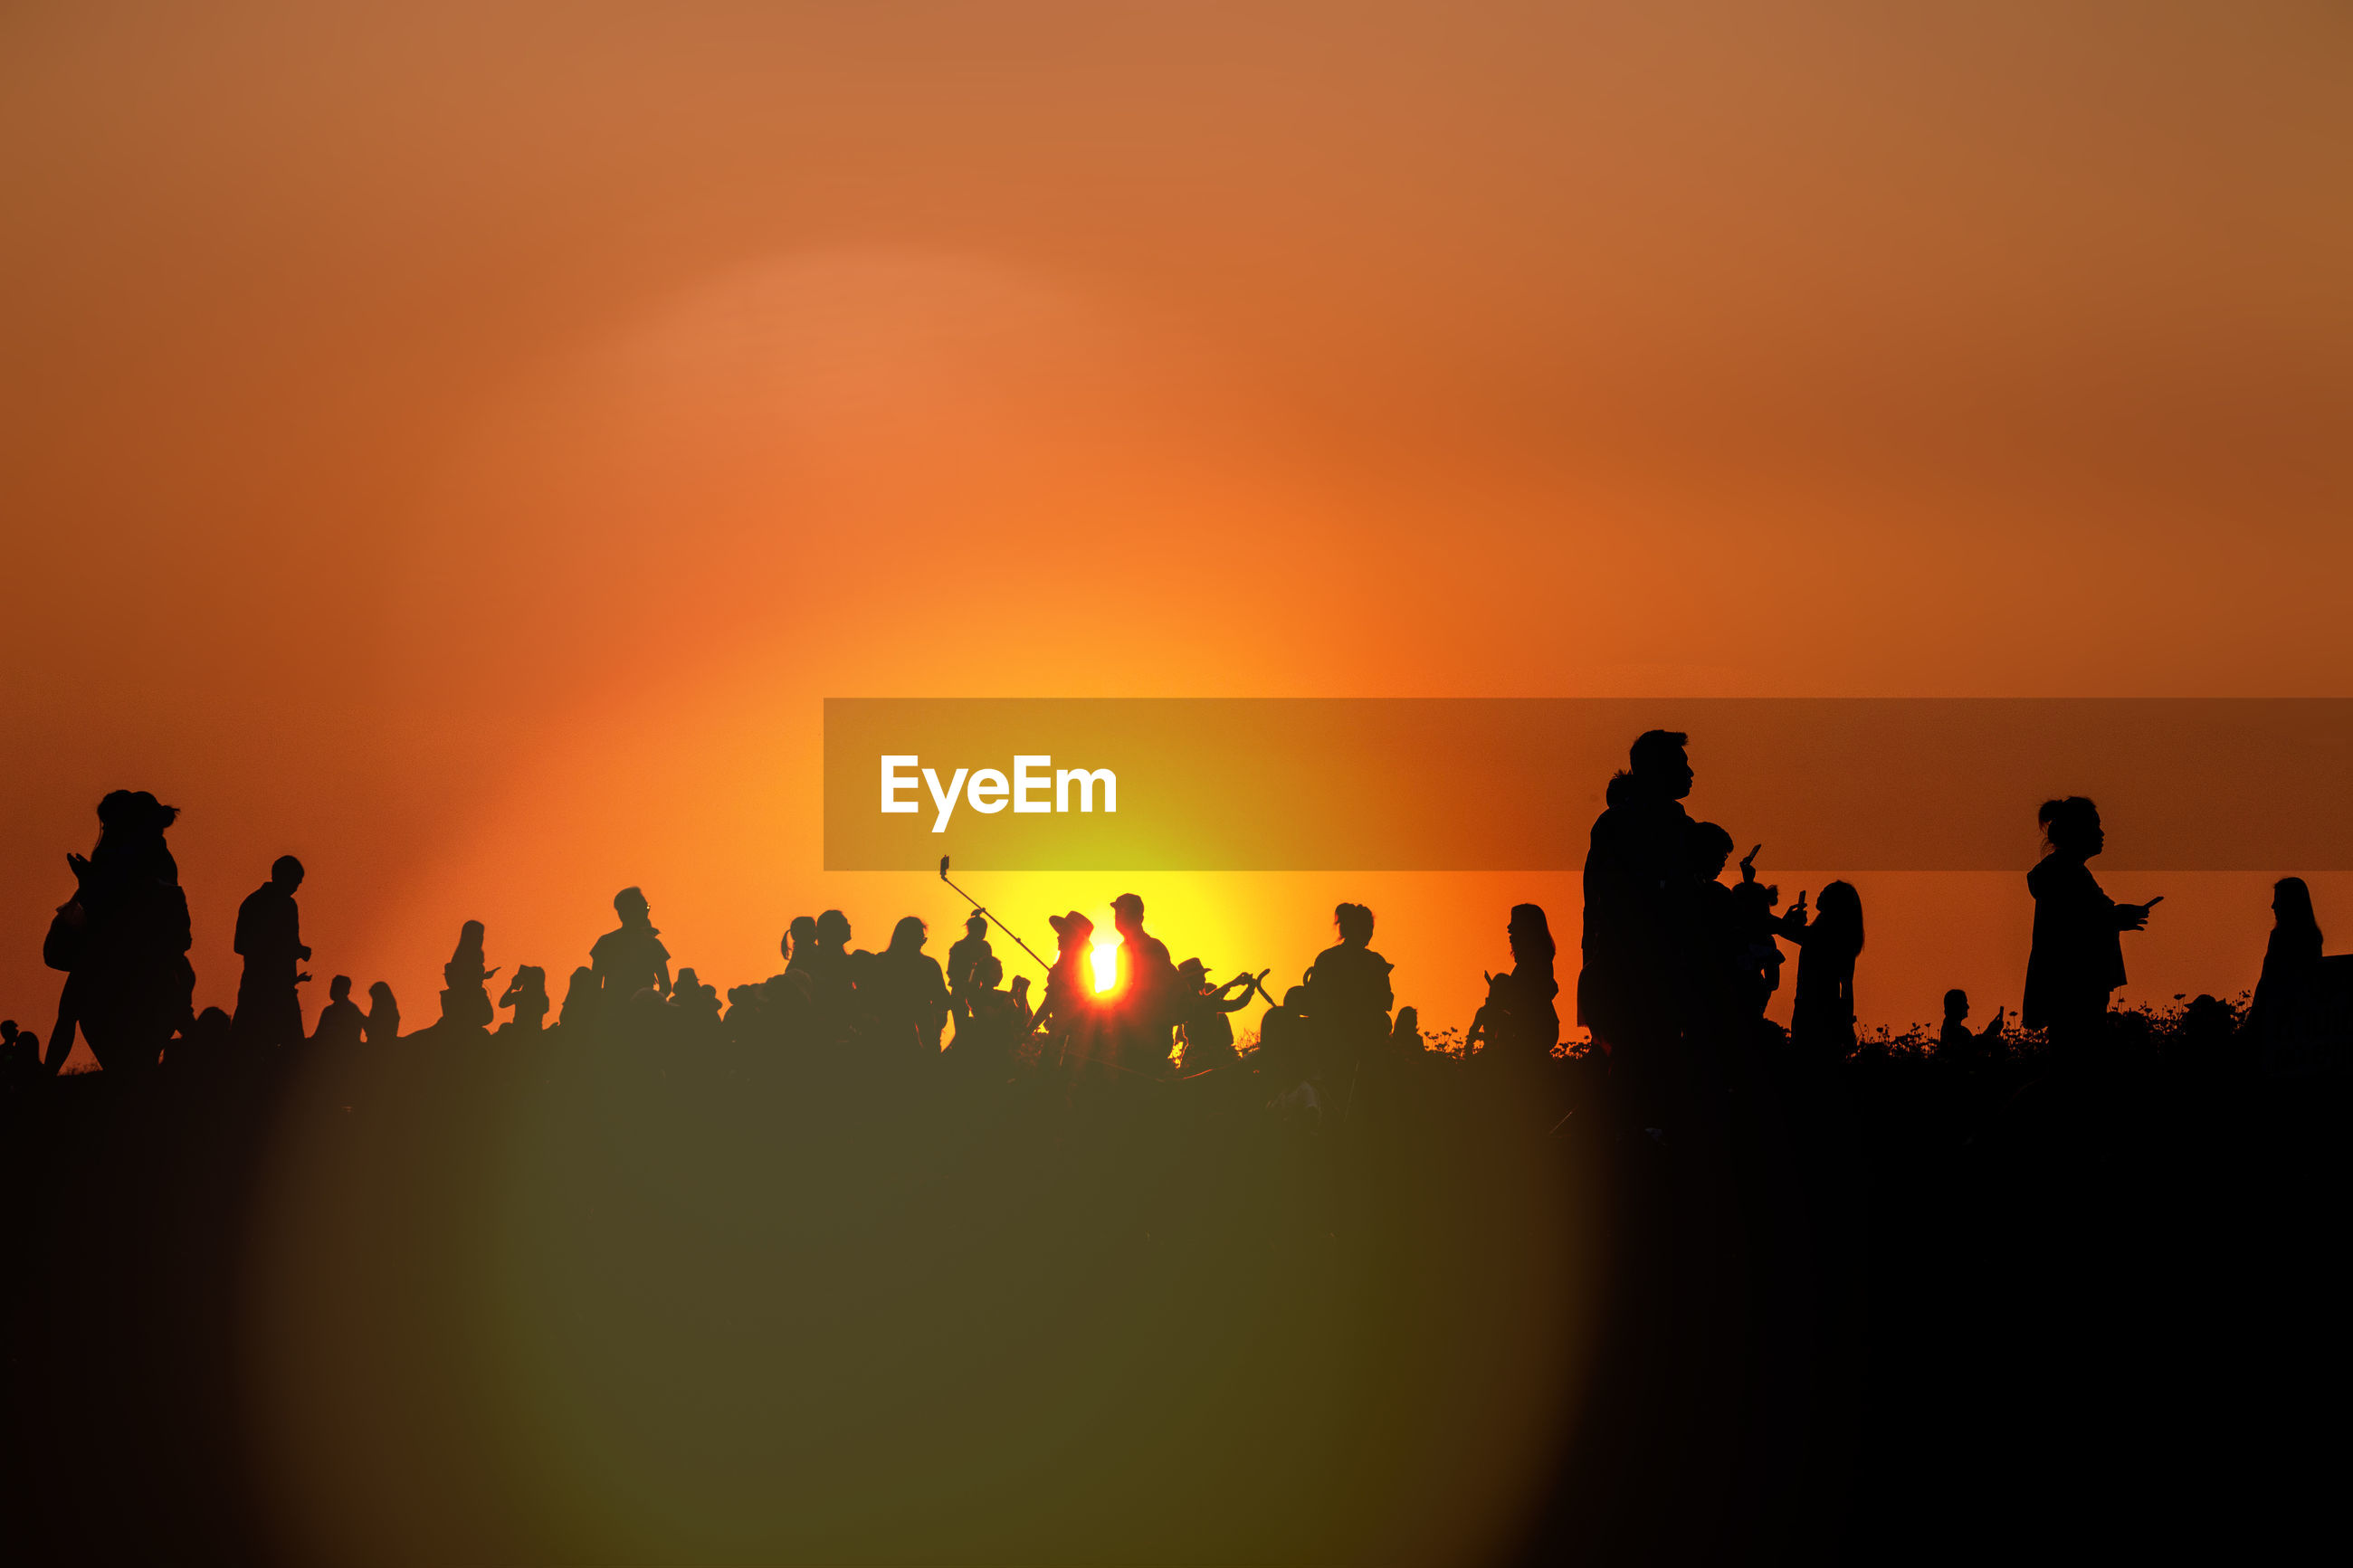 Silhouette people on field against clear orange sky